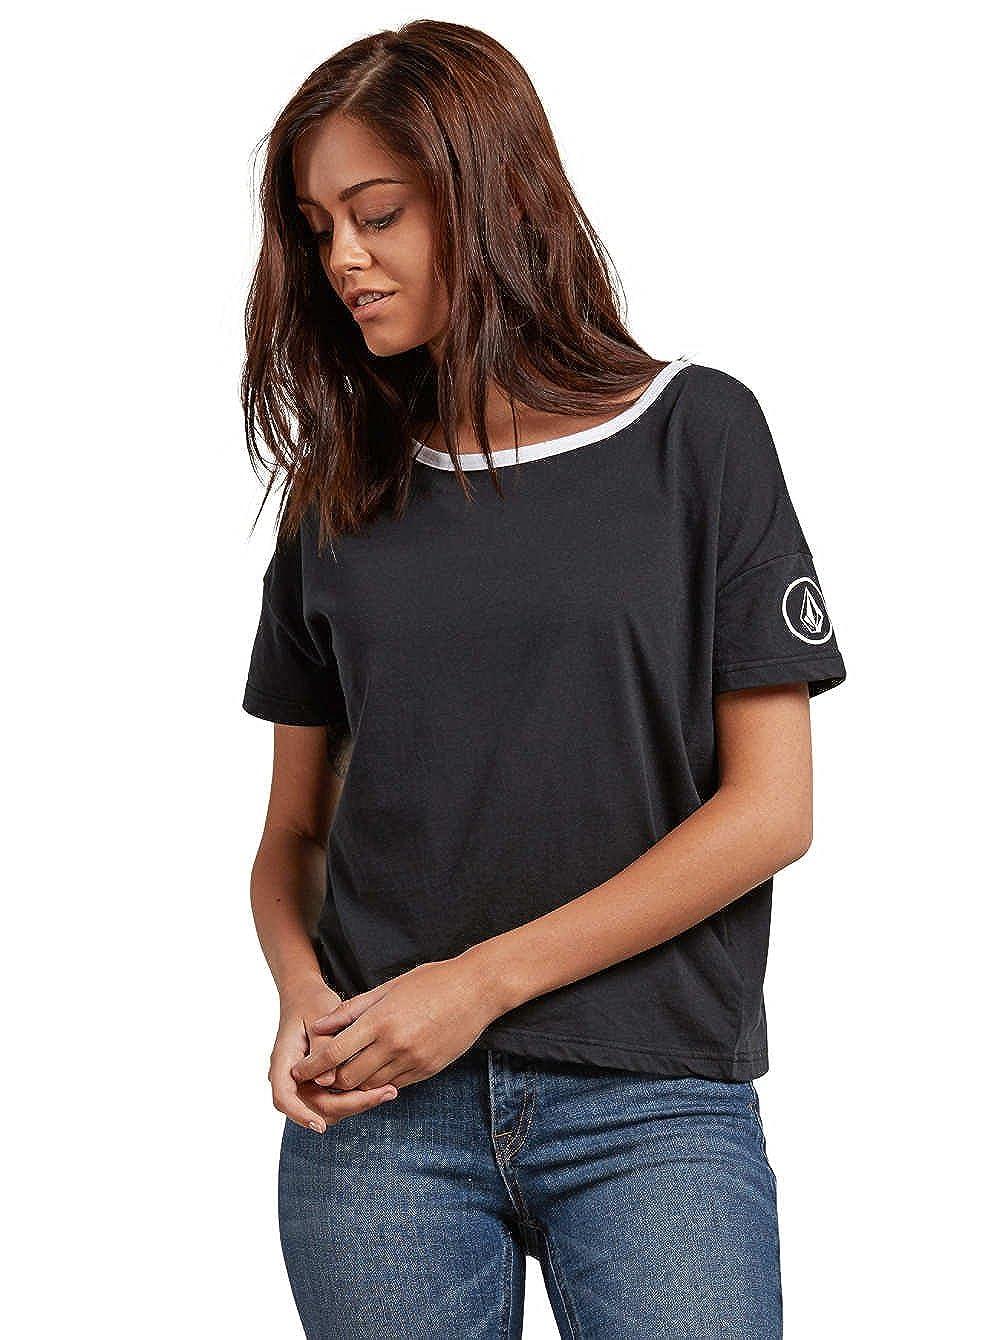 TALLA FR : S (Taille Fabricant : S). Volcom One of Each tee–Camiseta de Manga Corta para Mujer, Mujer, B3531850, Negro